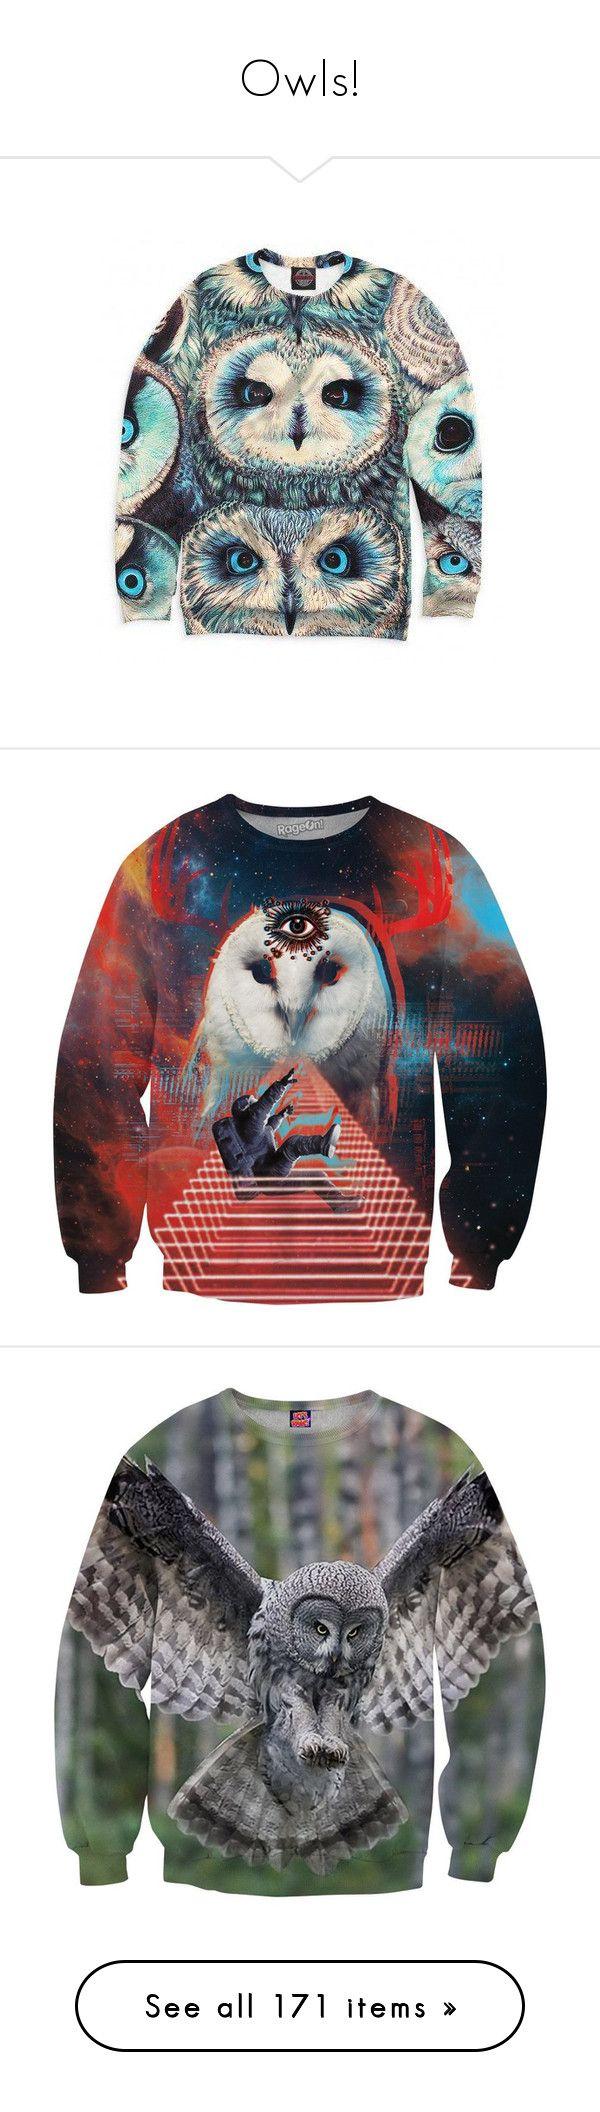 """Owls!"" by miss-image ❤ liked on Polyvore featuring men's fashion, men's clothing, men's hoodies, men's sweatshirts, mens short sleeve sweatshirt, mens galaxy sweatshirt, mens crewneck sweatshirt, mens crew neck sweatshirts, tops and sweaters"